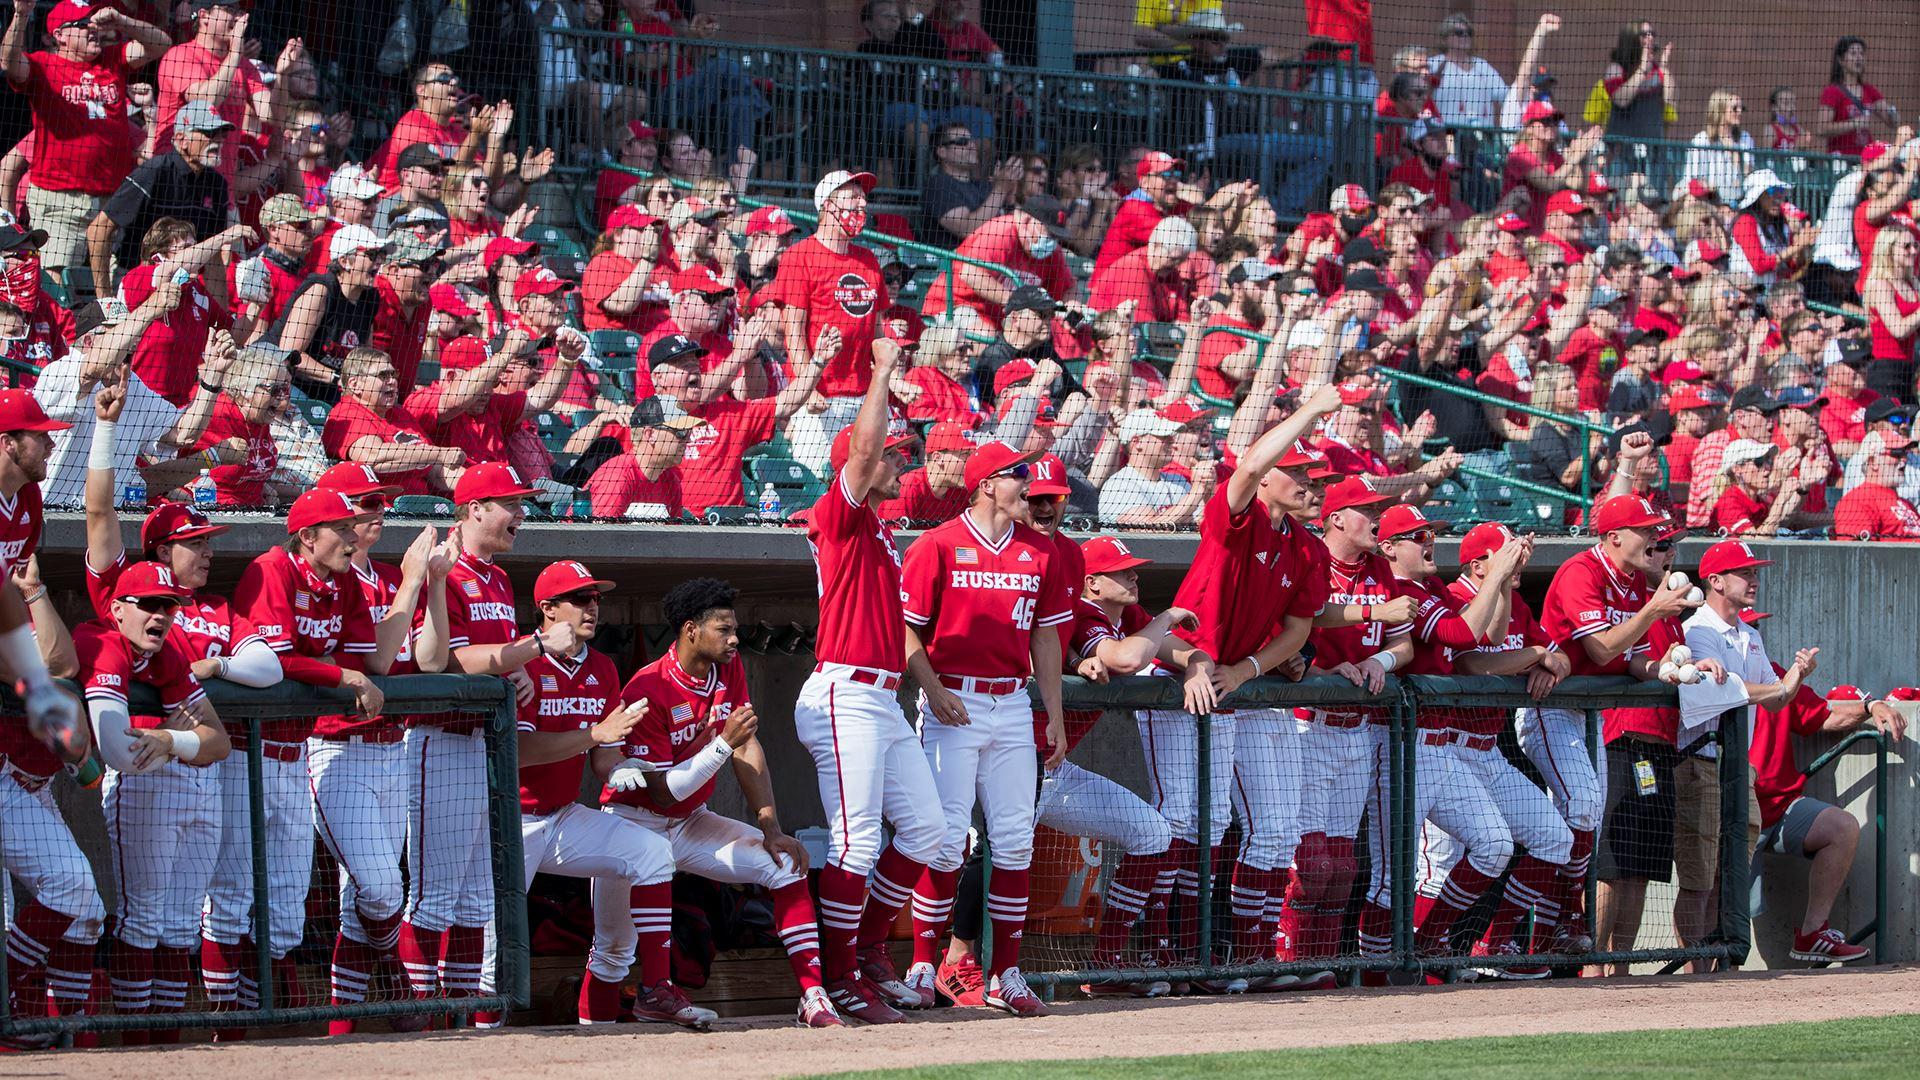 Huskers headed to Fayetteville for NCAA baseball regional